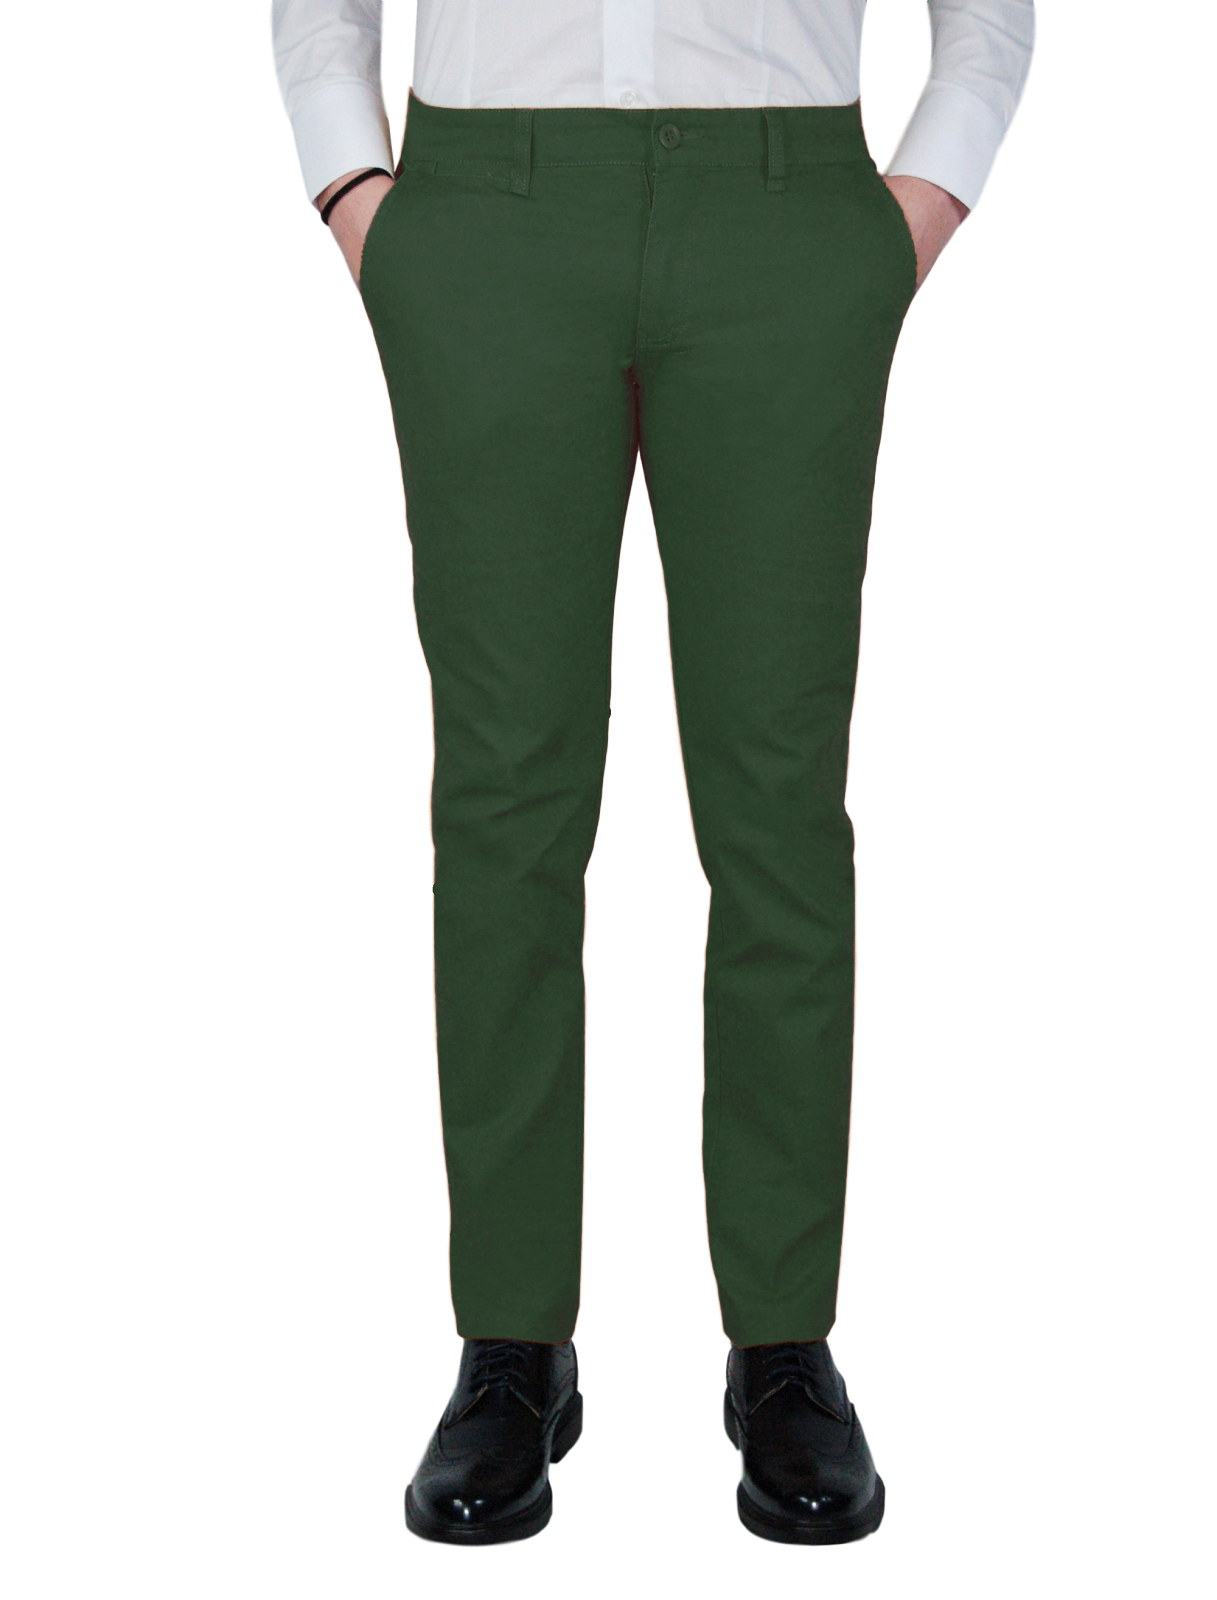 Pantalone-Uomo-Chino-Primaverile-slim-fit-Pantaloni-Eleganti-Blu-Verde-Nero miniatura 21